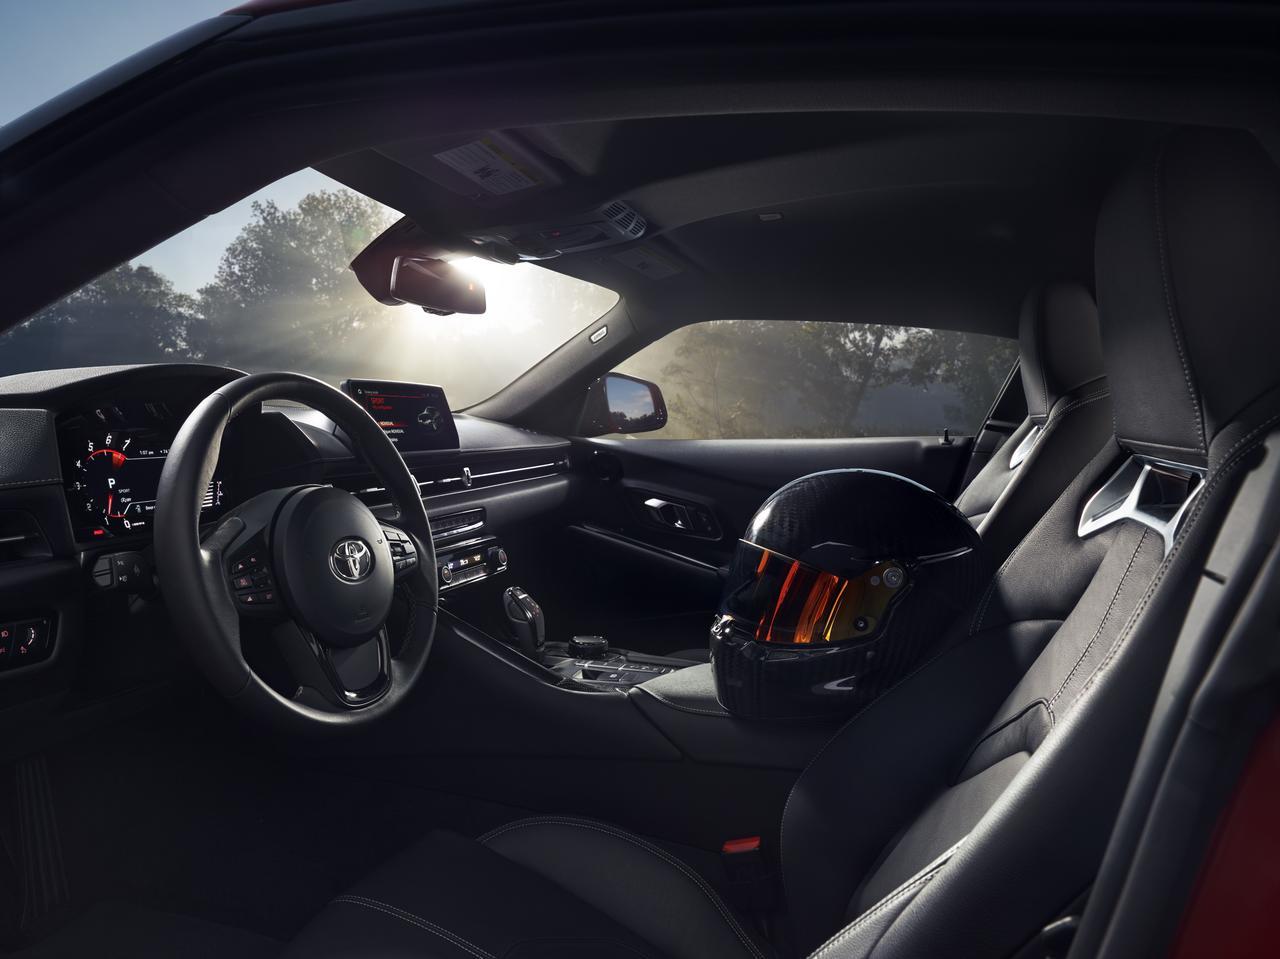 2020 Toyota Corolla Seats